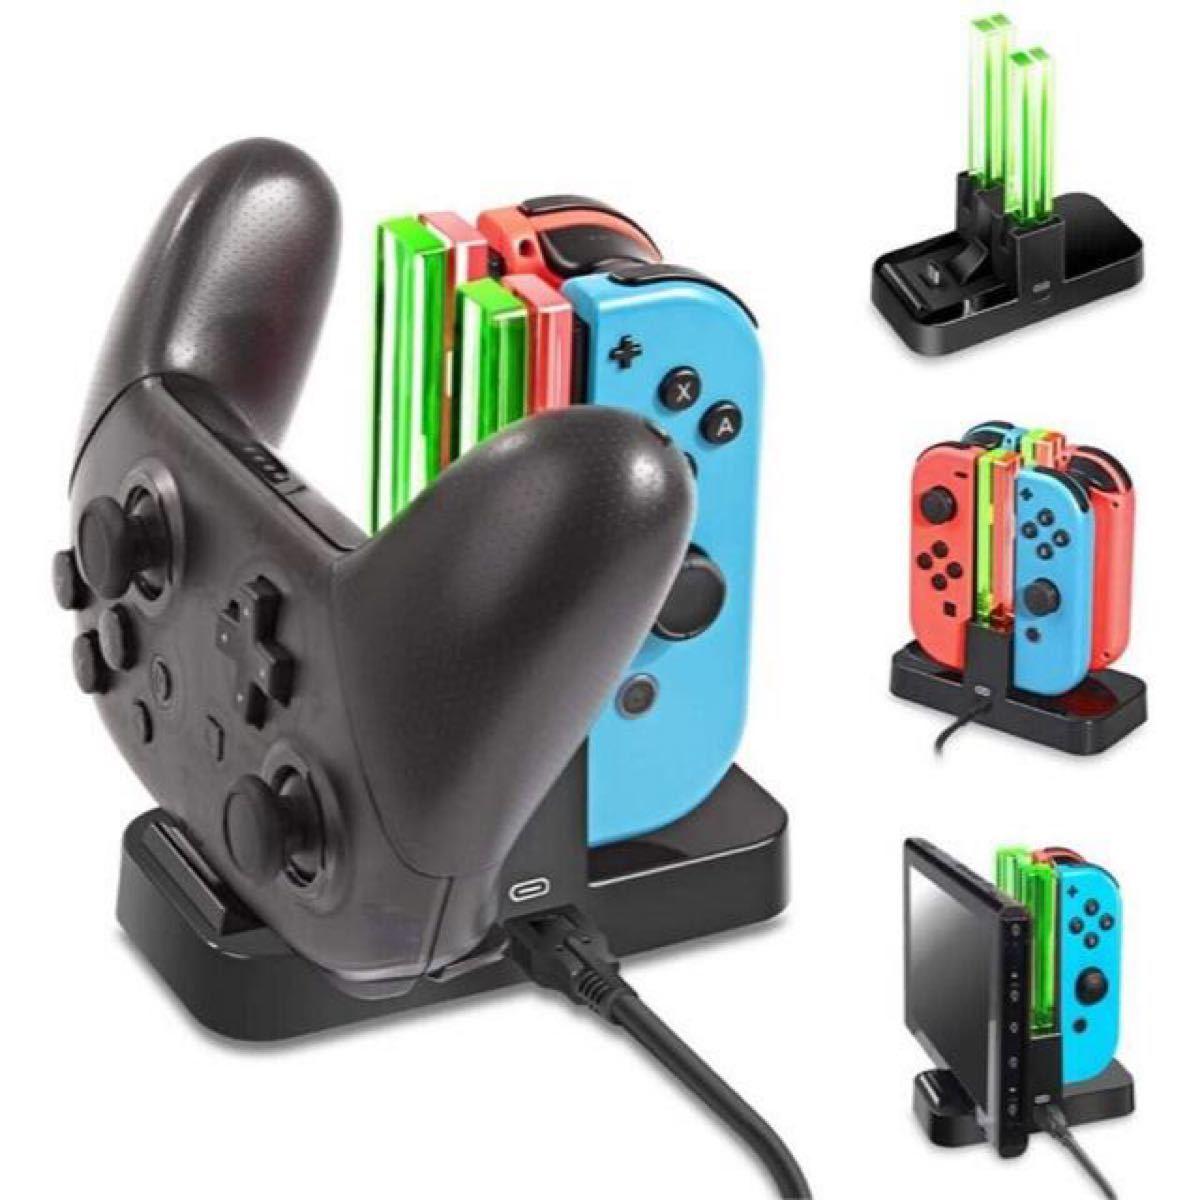 Joy-Con 充電スタンド ジョイコン充電 Nintendo Switchチャー